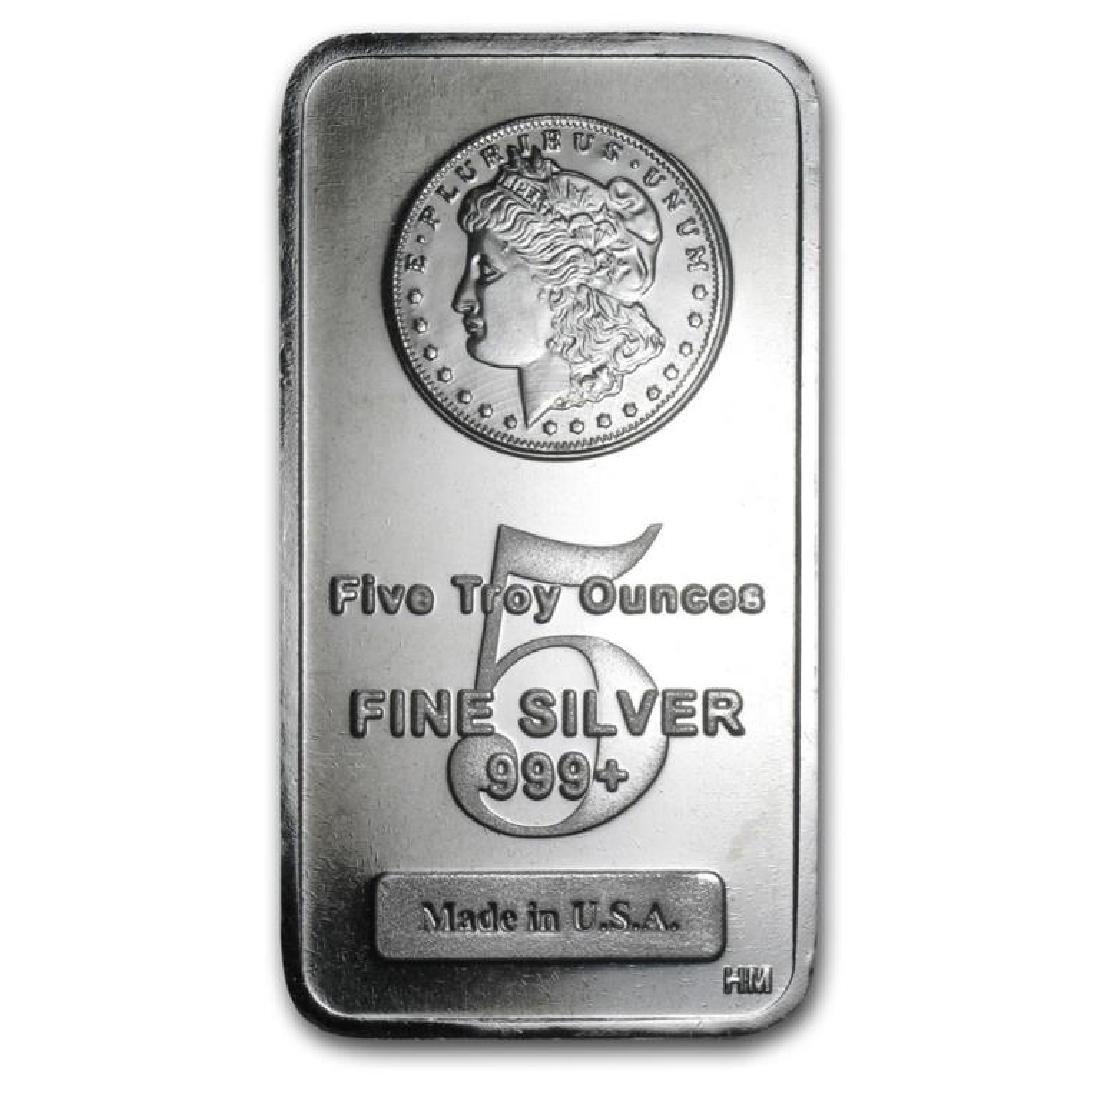 Pure Silver 5 oz Bar Morgan Design